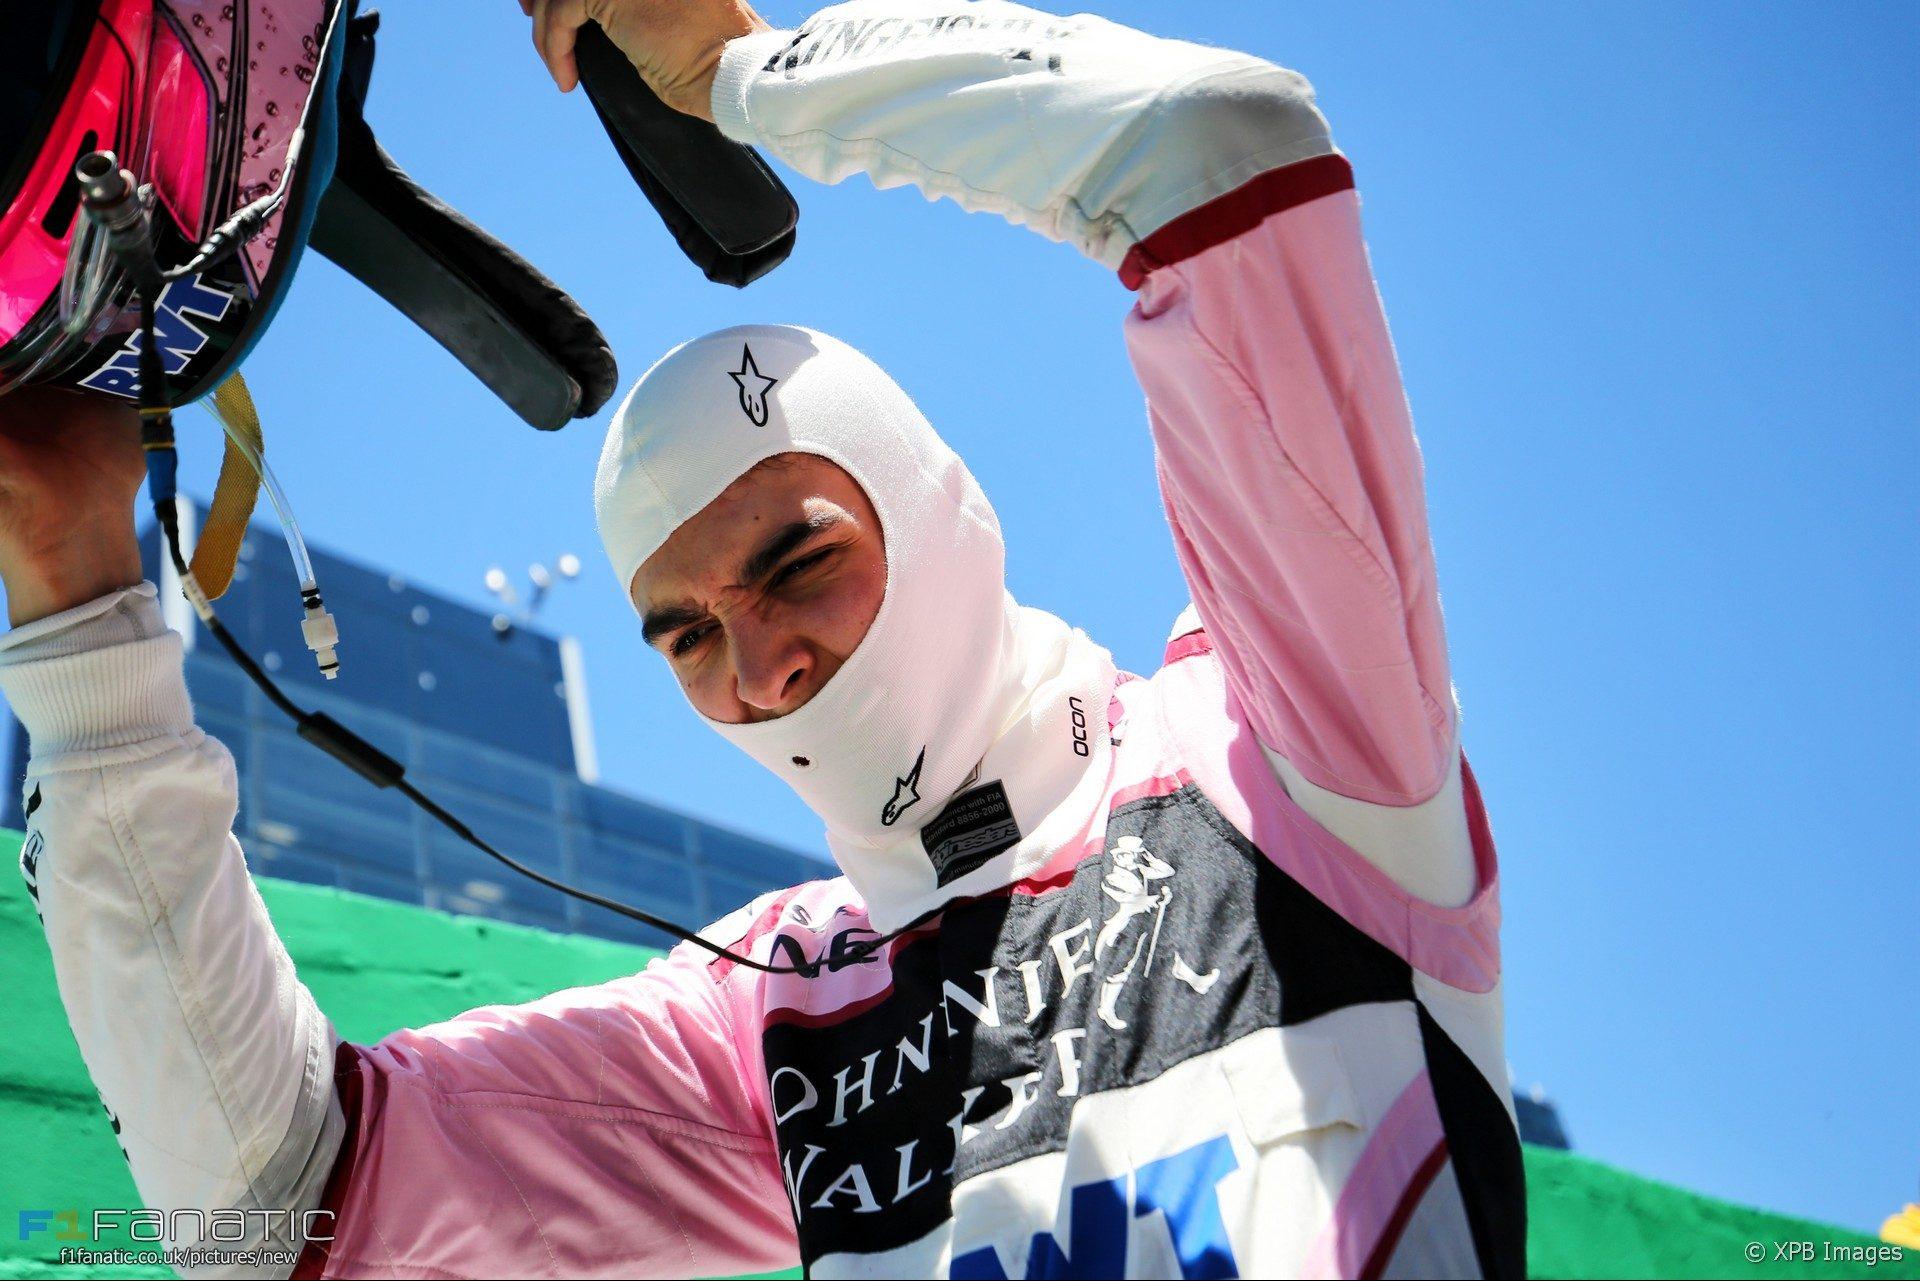 Esteban Ocon, Force India, Interlagos, 2017